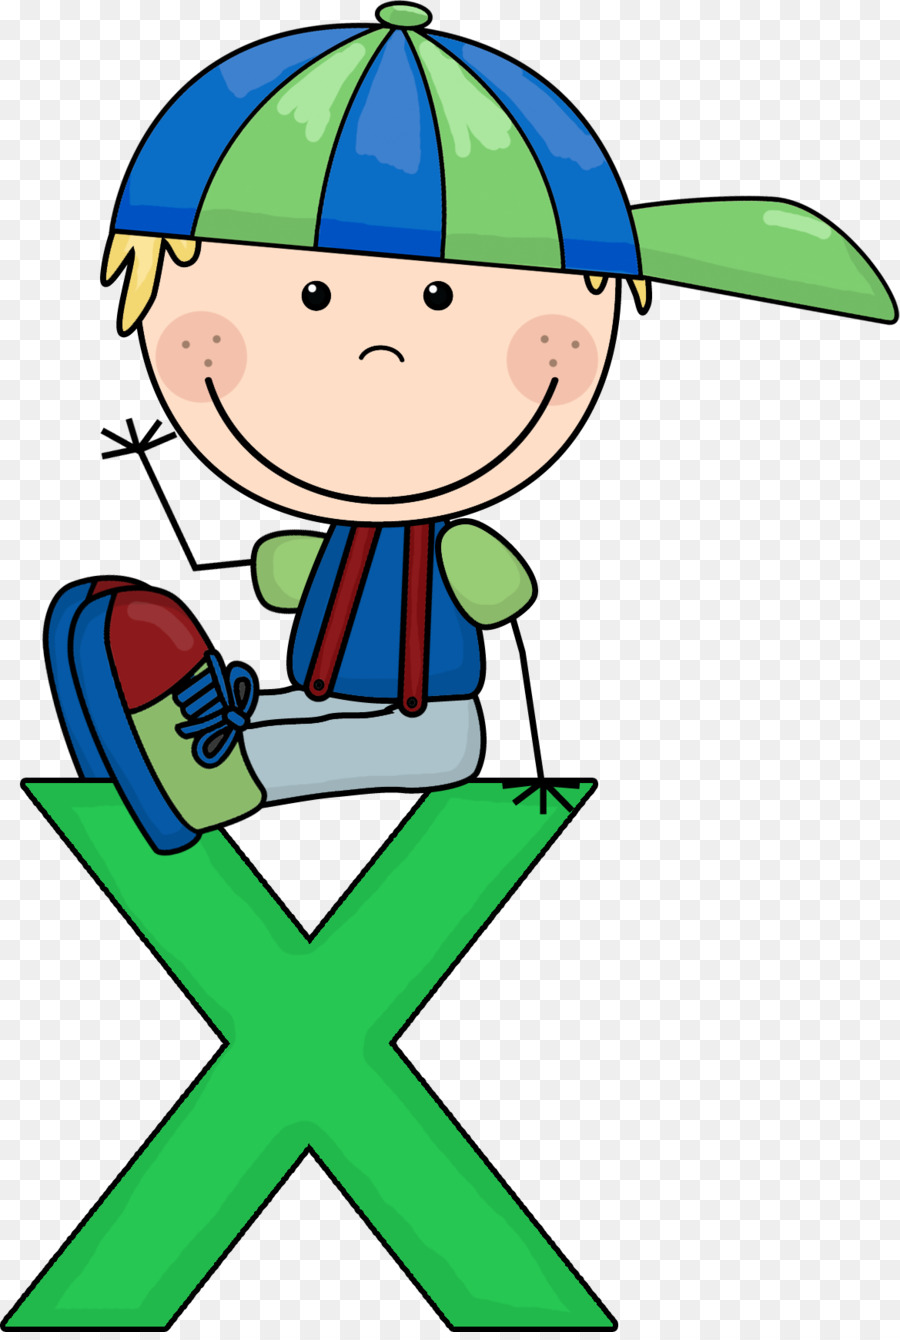 Multiplication clipart mathematic. Boy cartoon png download